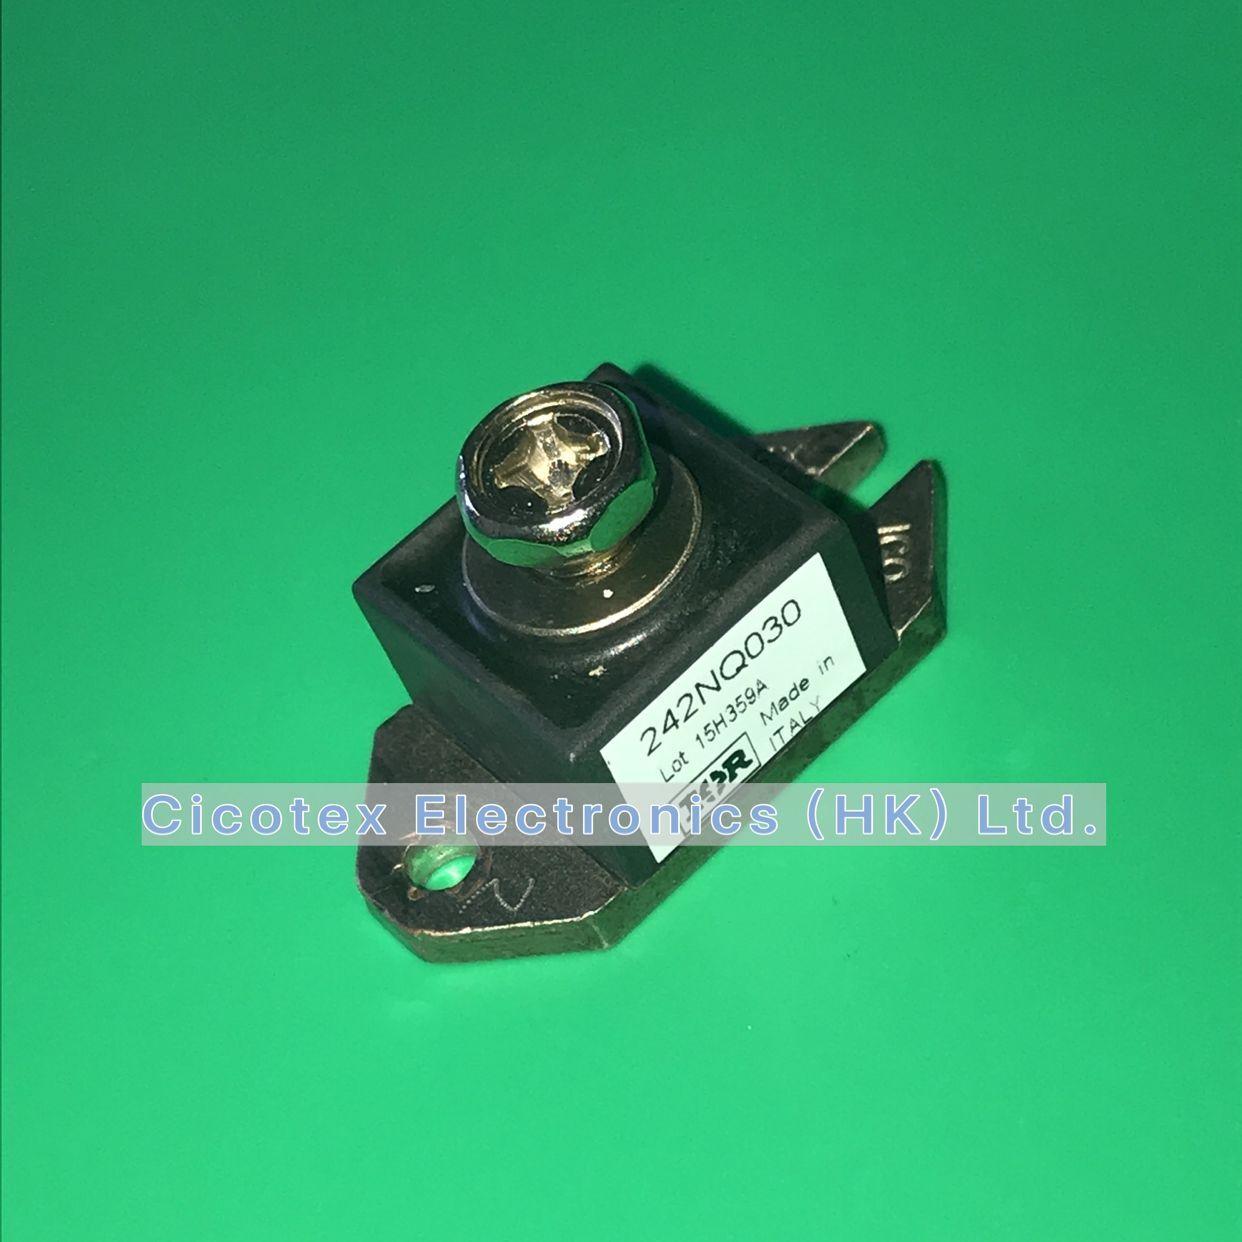 242NQ030 MODULE IGBT DIODE SCHOTTKY 30V 240A D-67 242NQ030PBF VS-242NQ030PBF VS-242NQ030